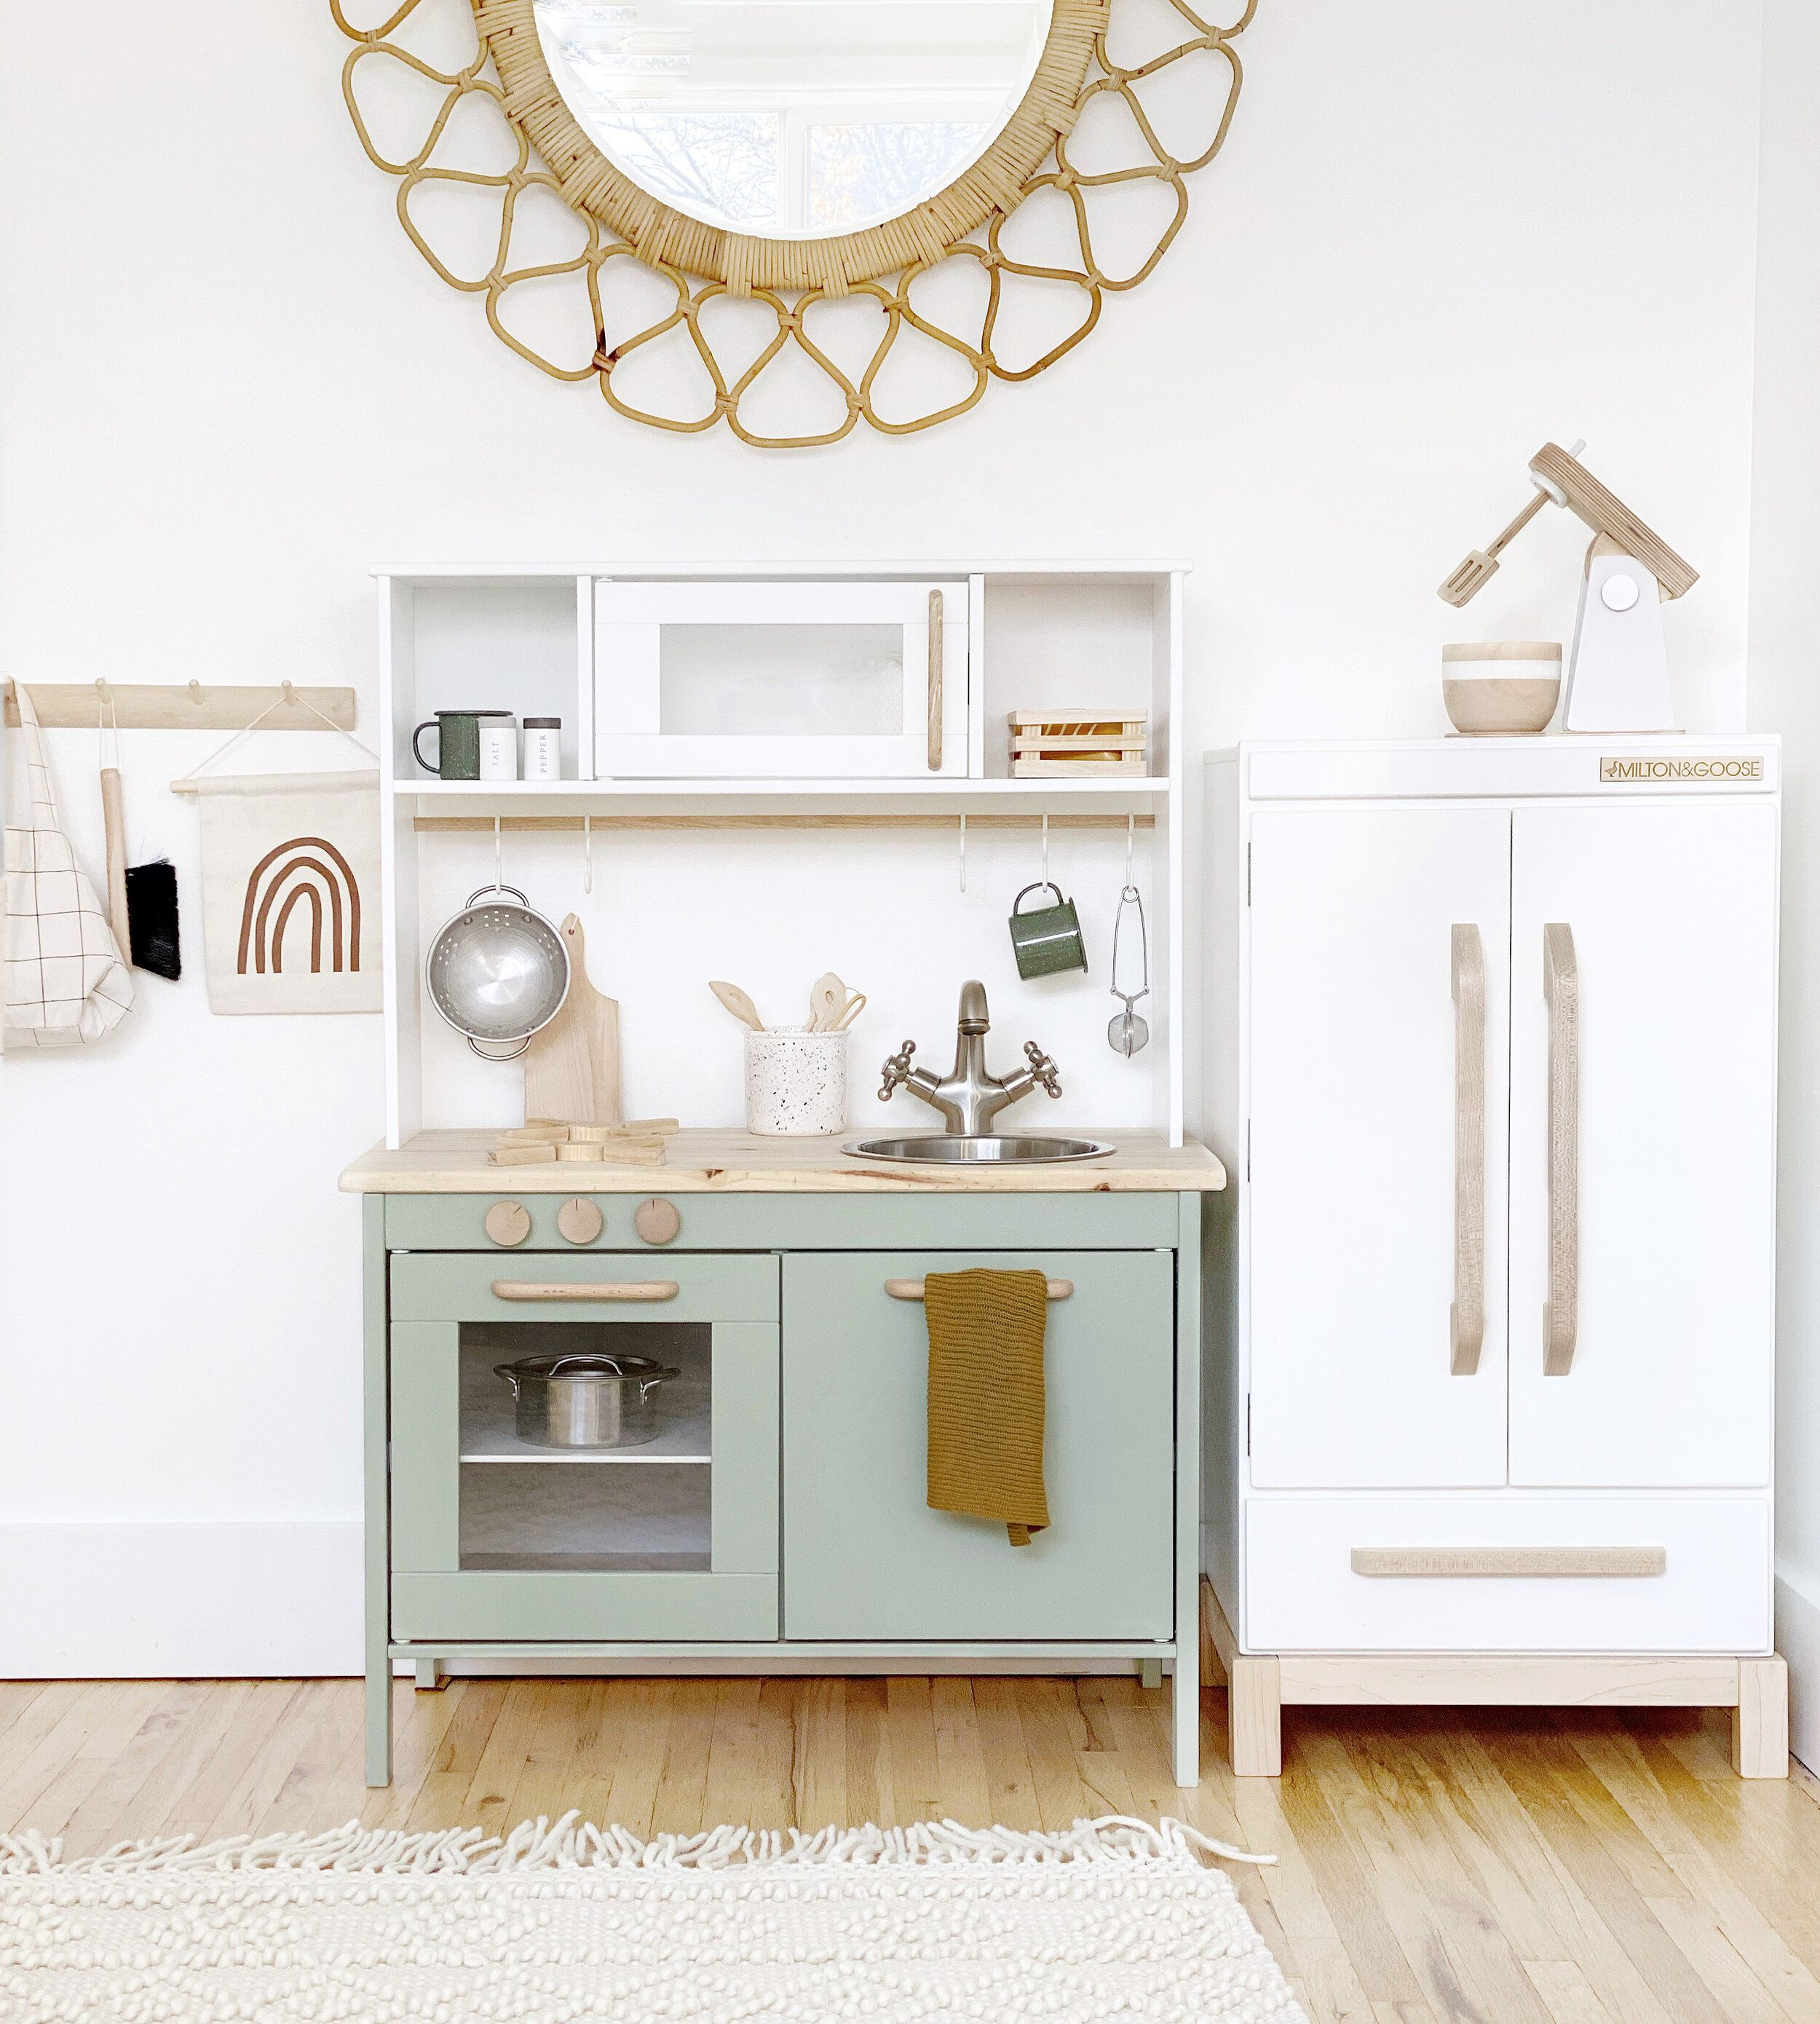 Ikea play kitchen hack Ikea play kitchen, Kitchen hacks